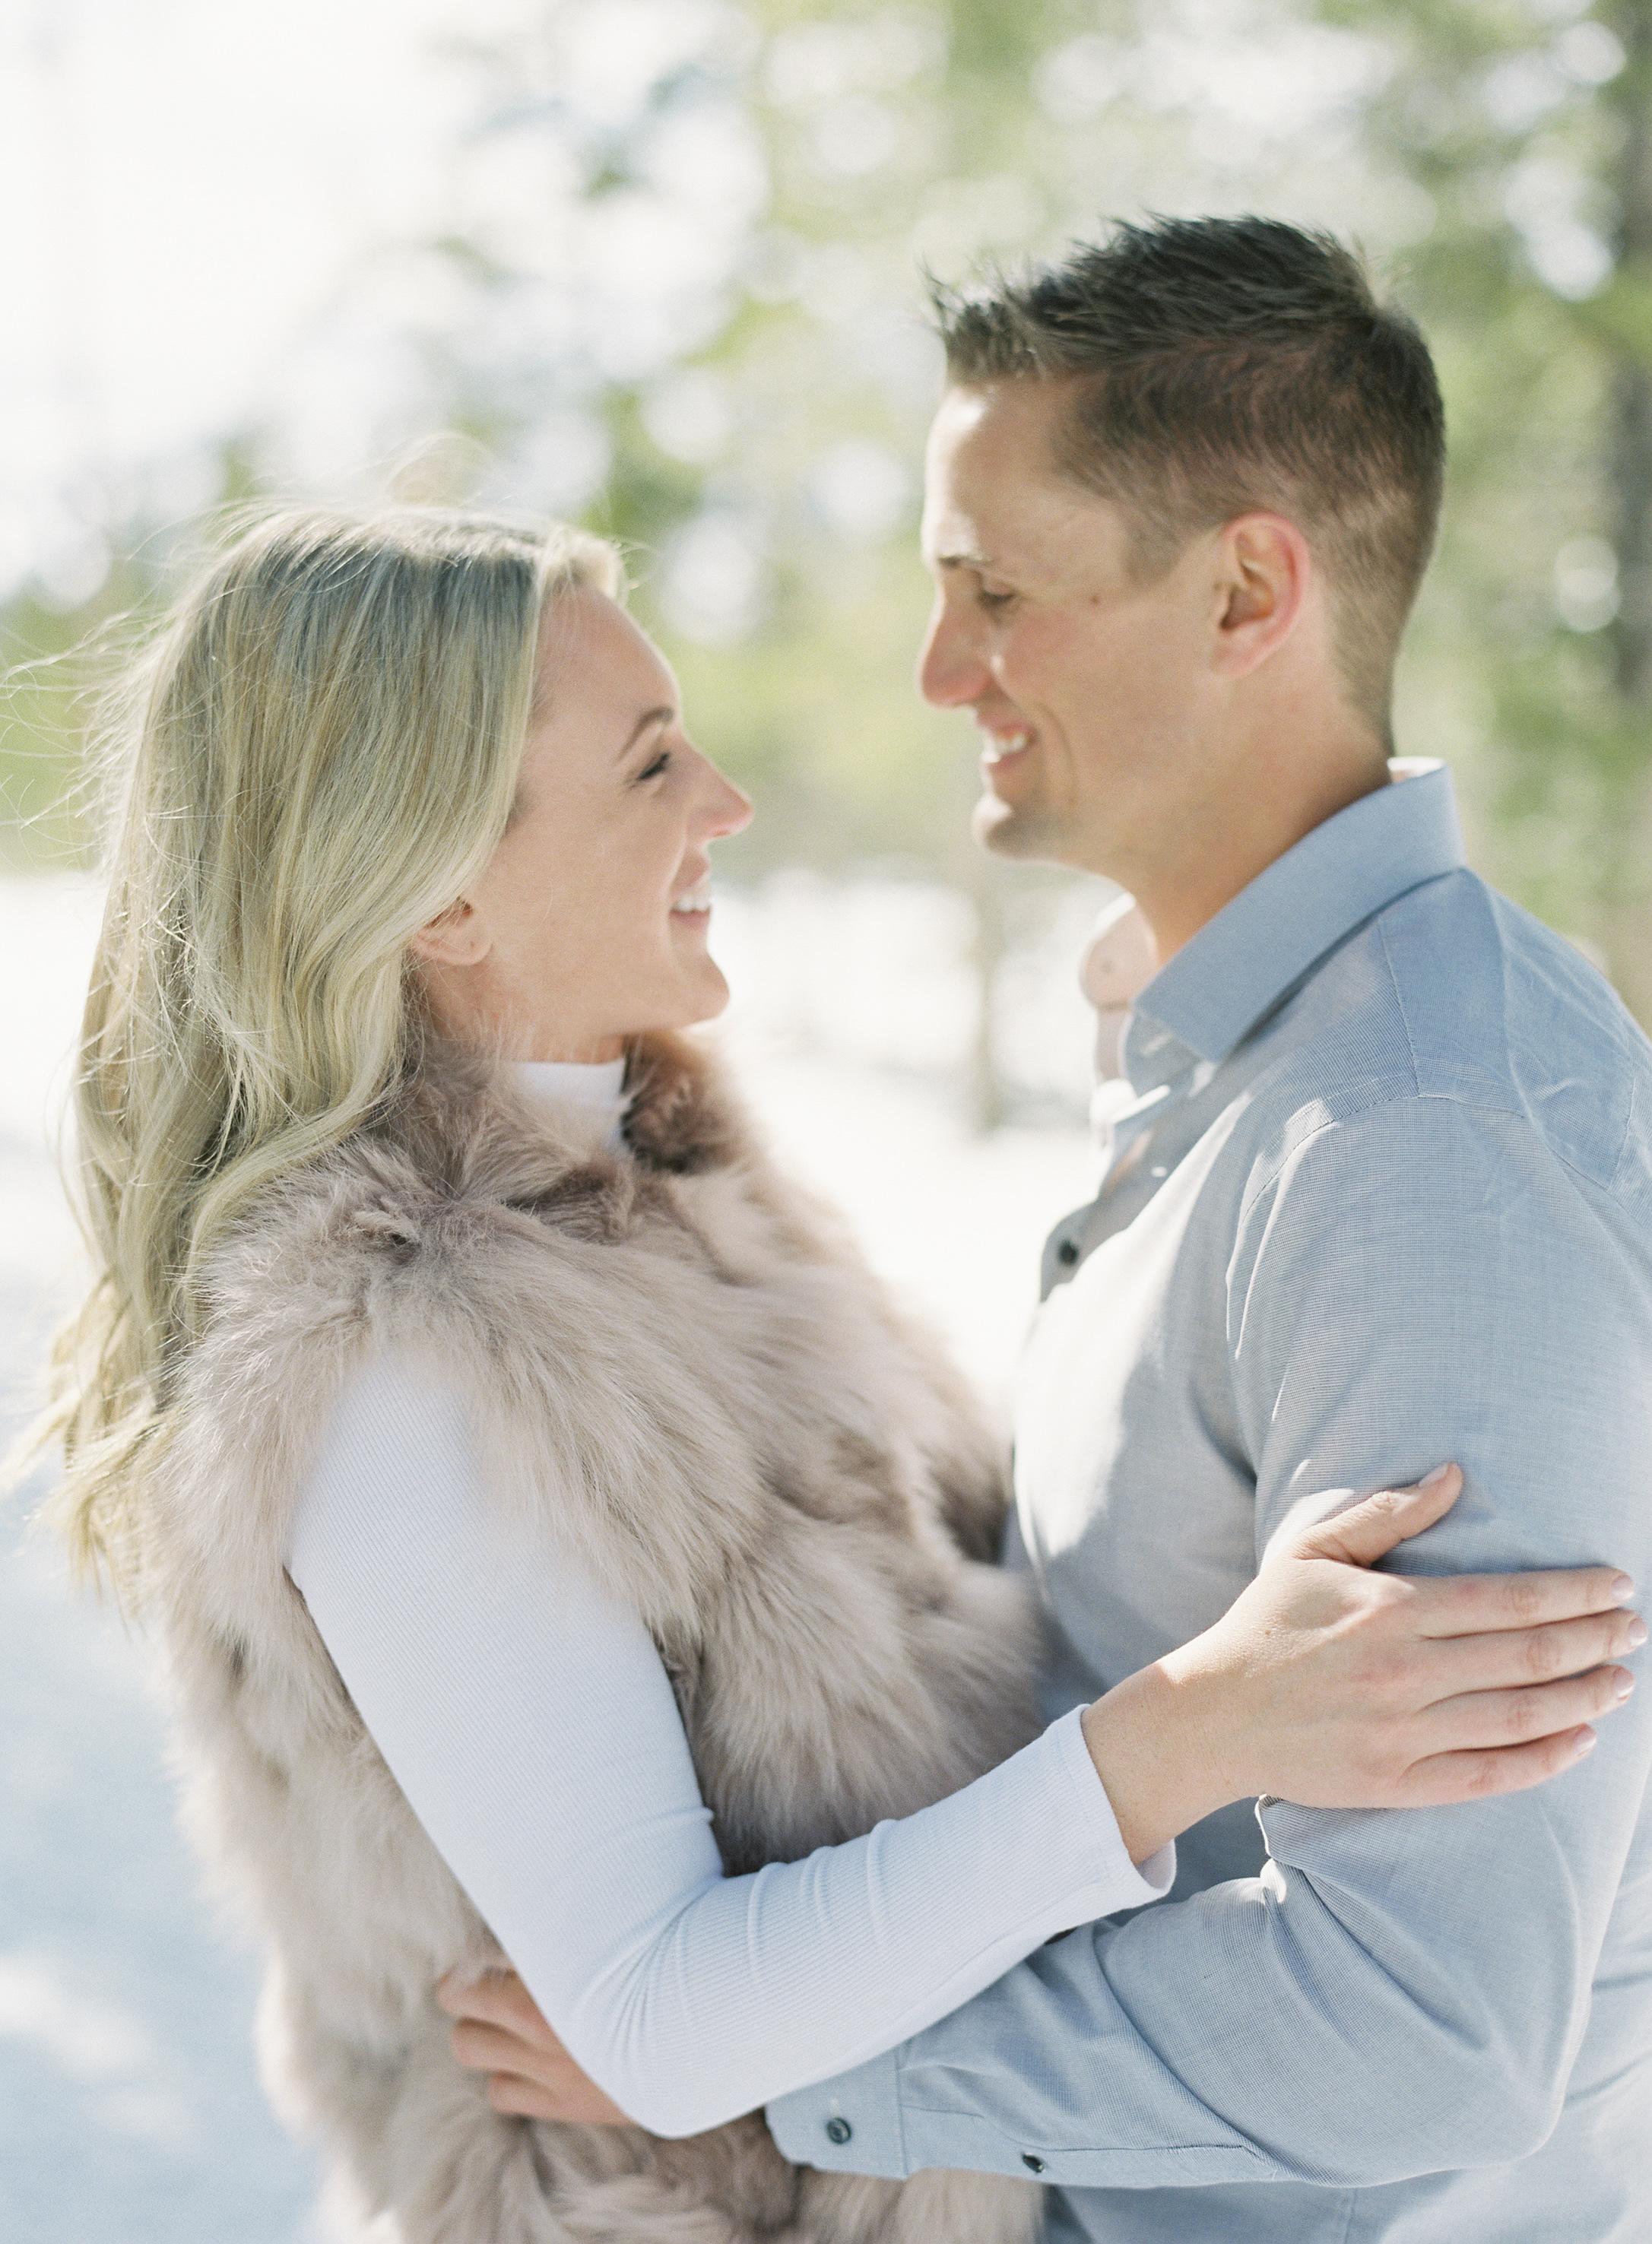 Sarah and John Engaged-Carrie King Photographer25.jpg